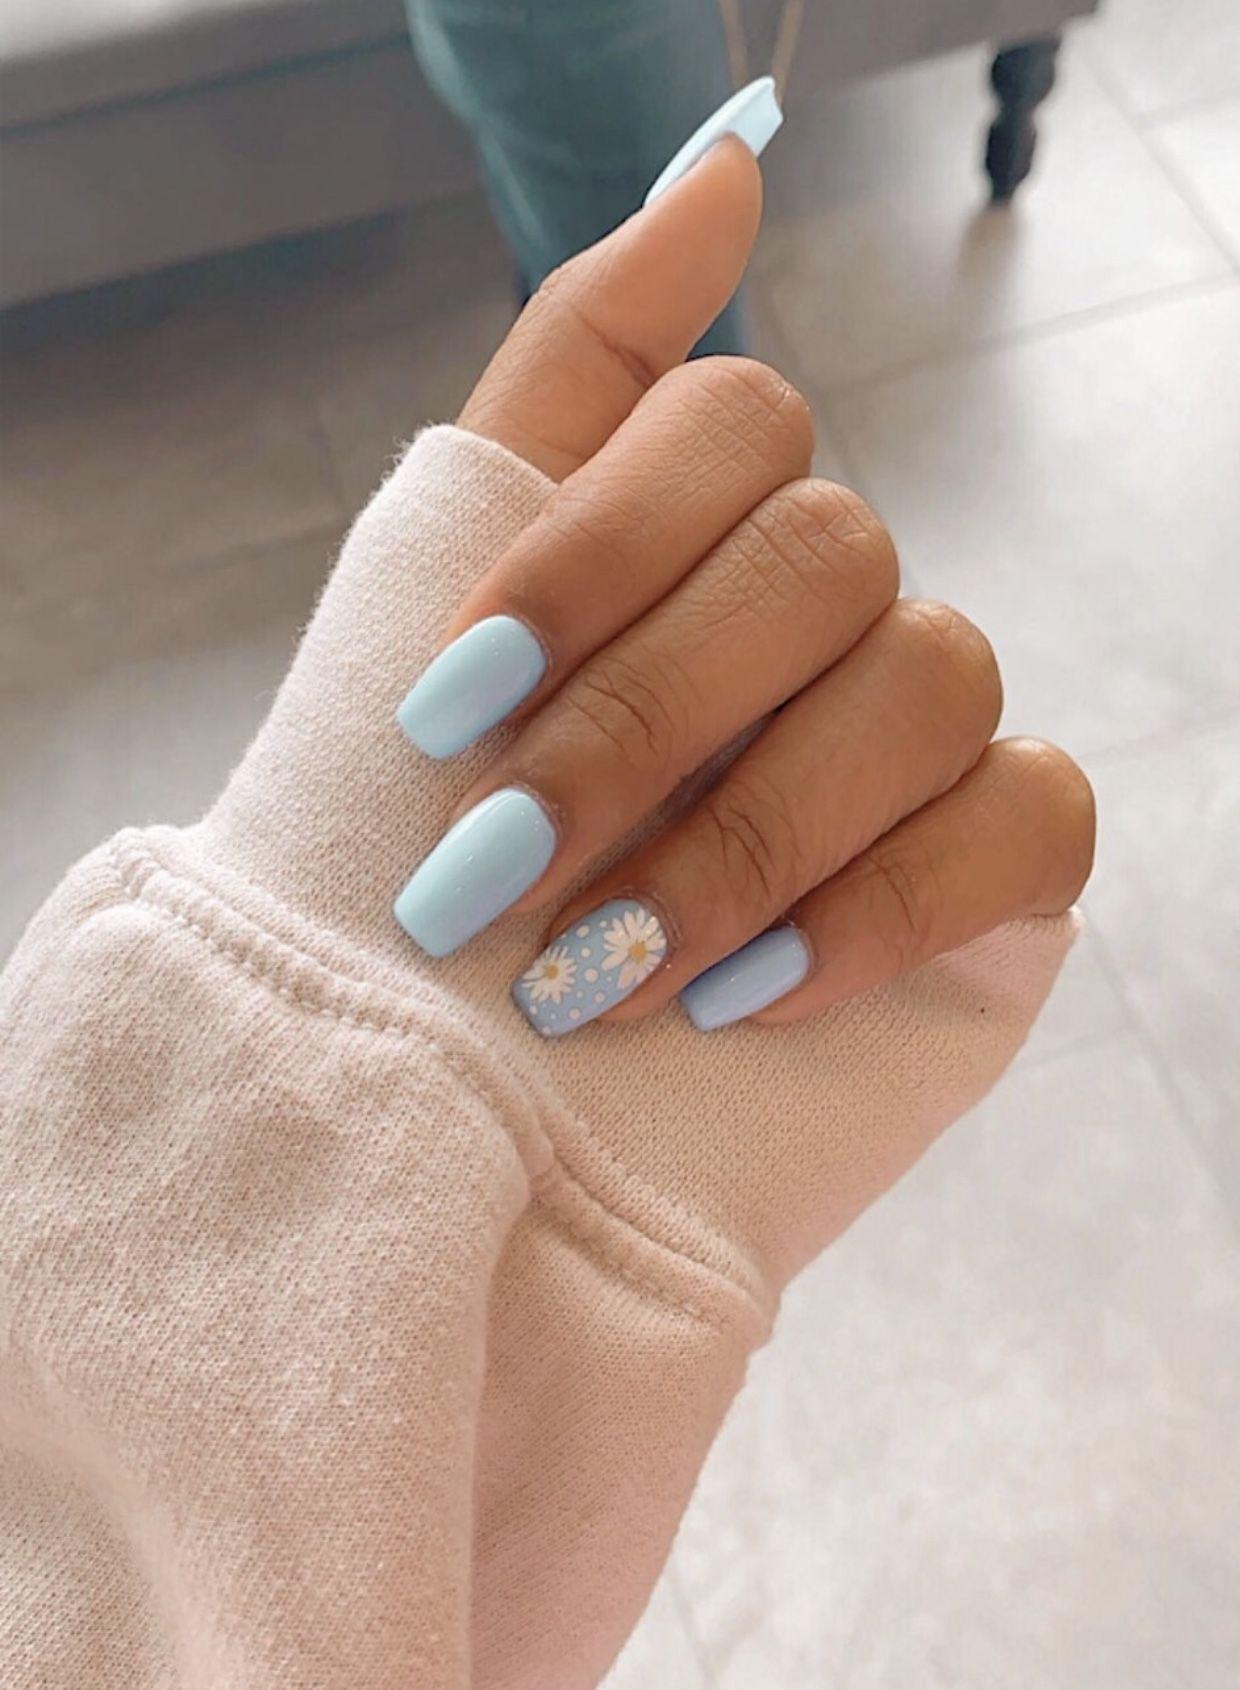 Sweet acrylic nails 752593787714533872 - nails ❧ Pinterest: taramelissa__ #nai ... - Welcome to Blog